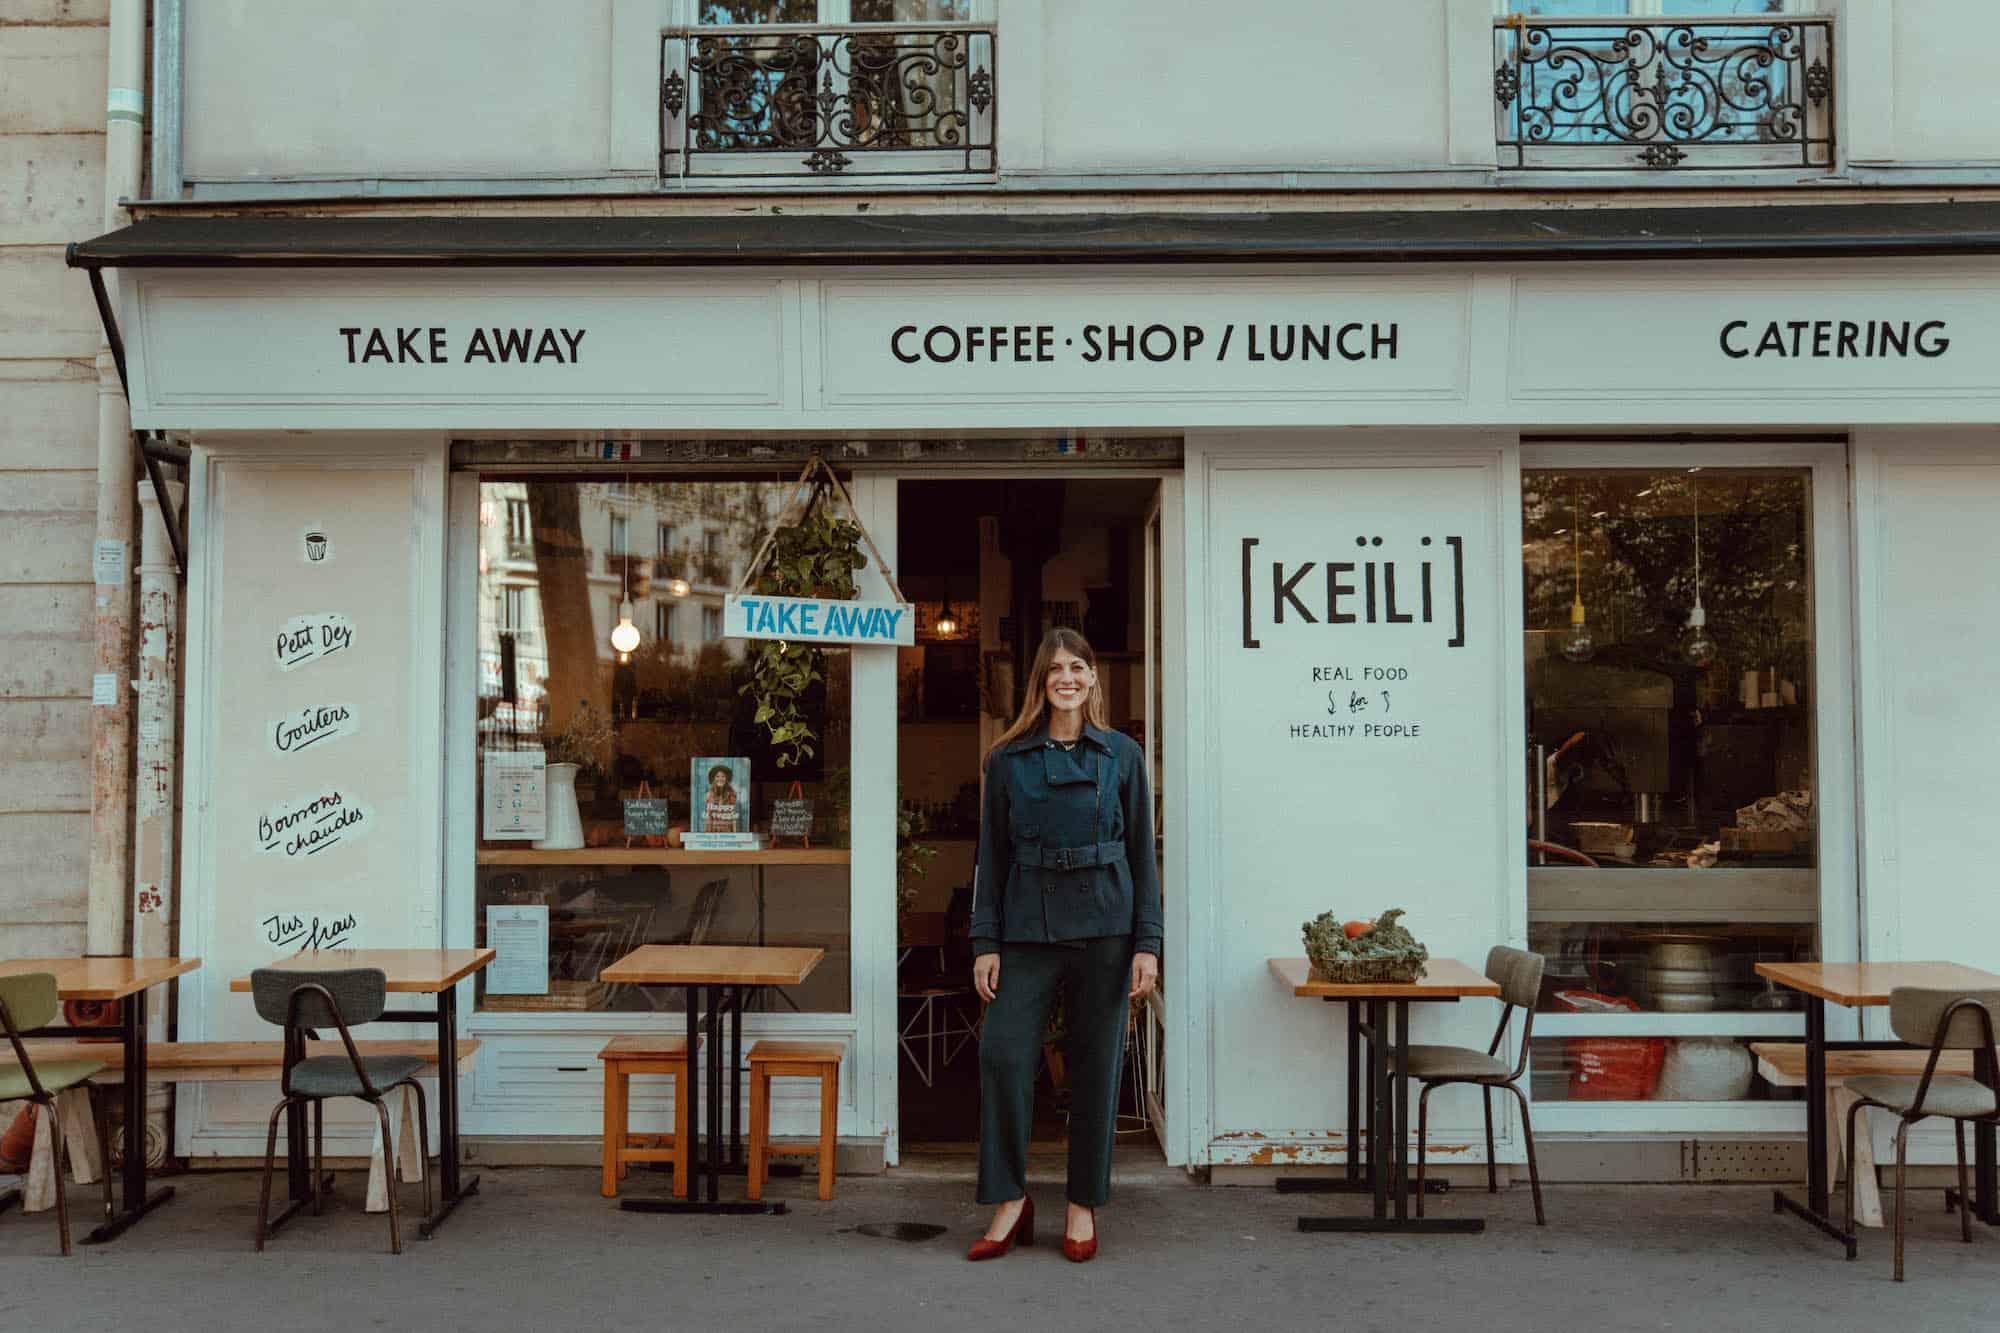 Caleigh Megless Schmidt outside Keili cafe